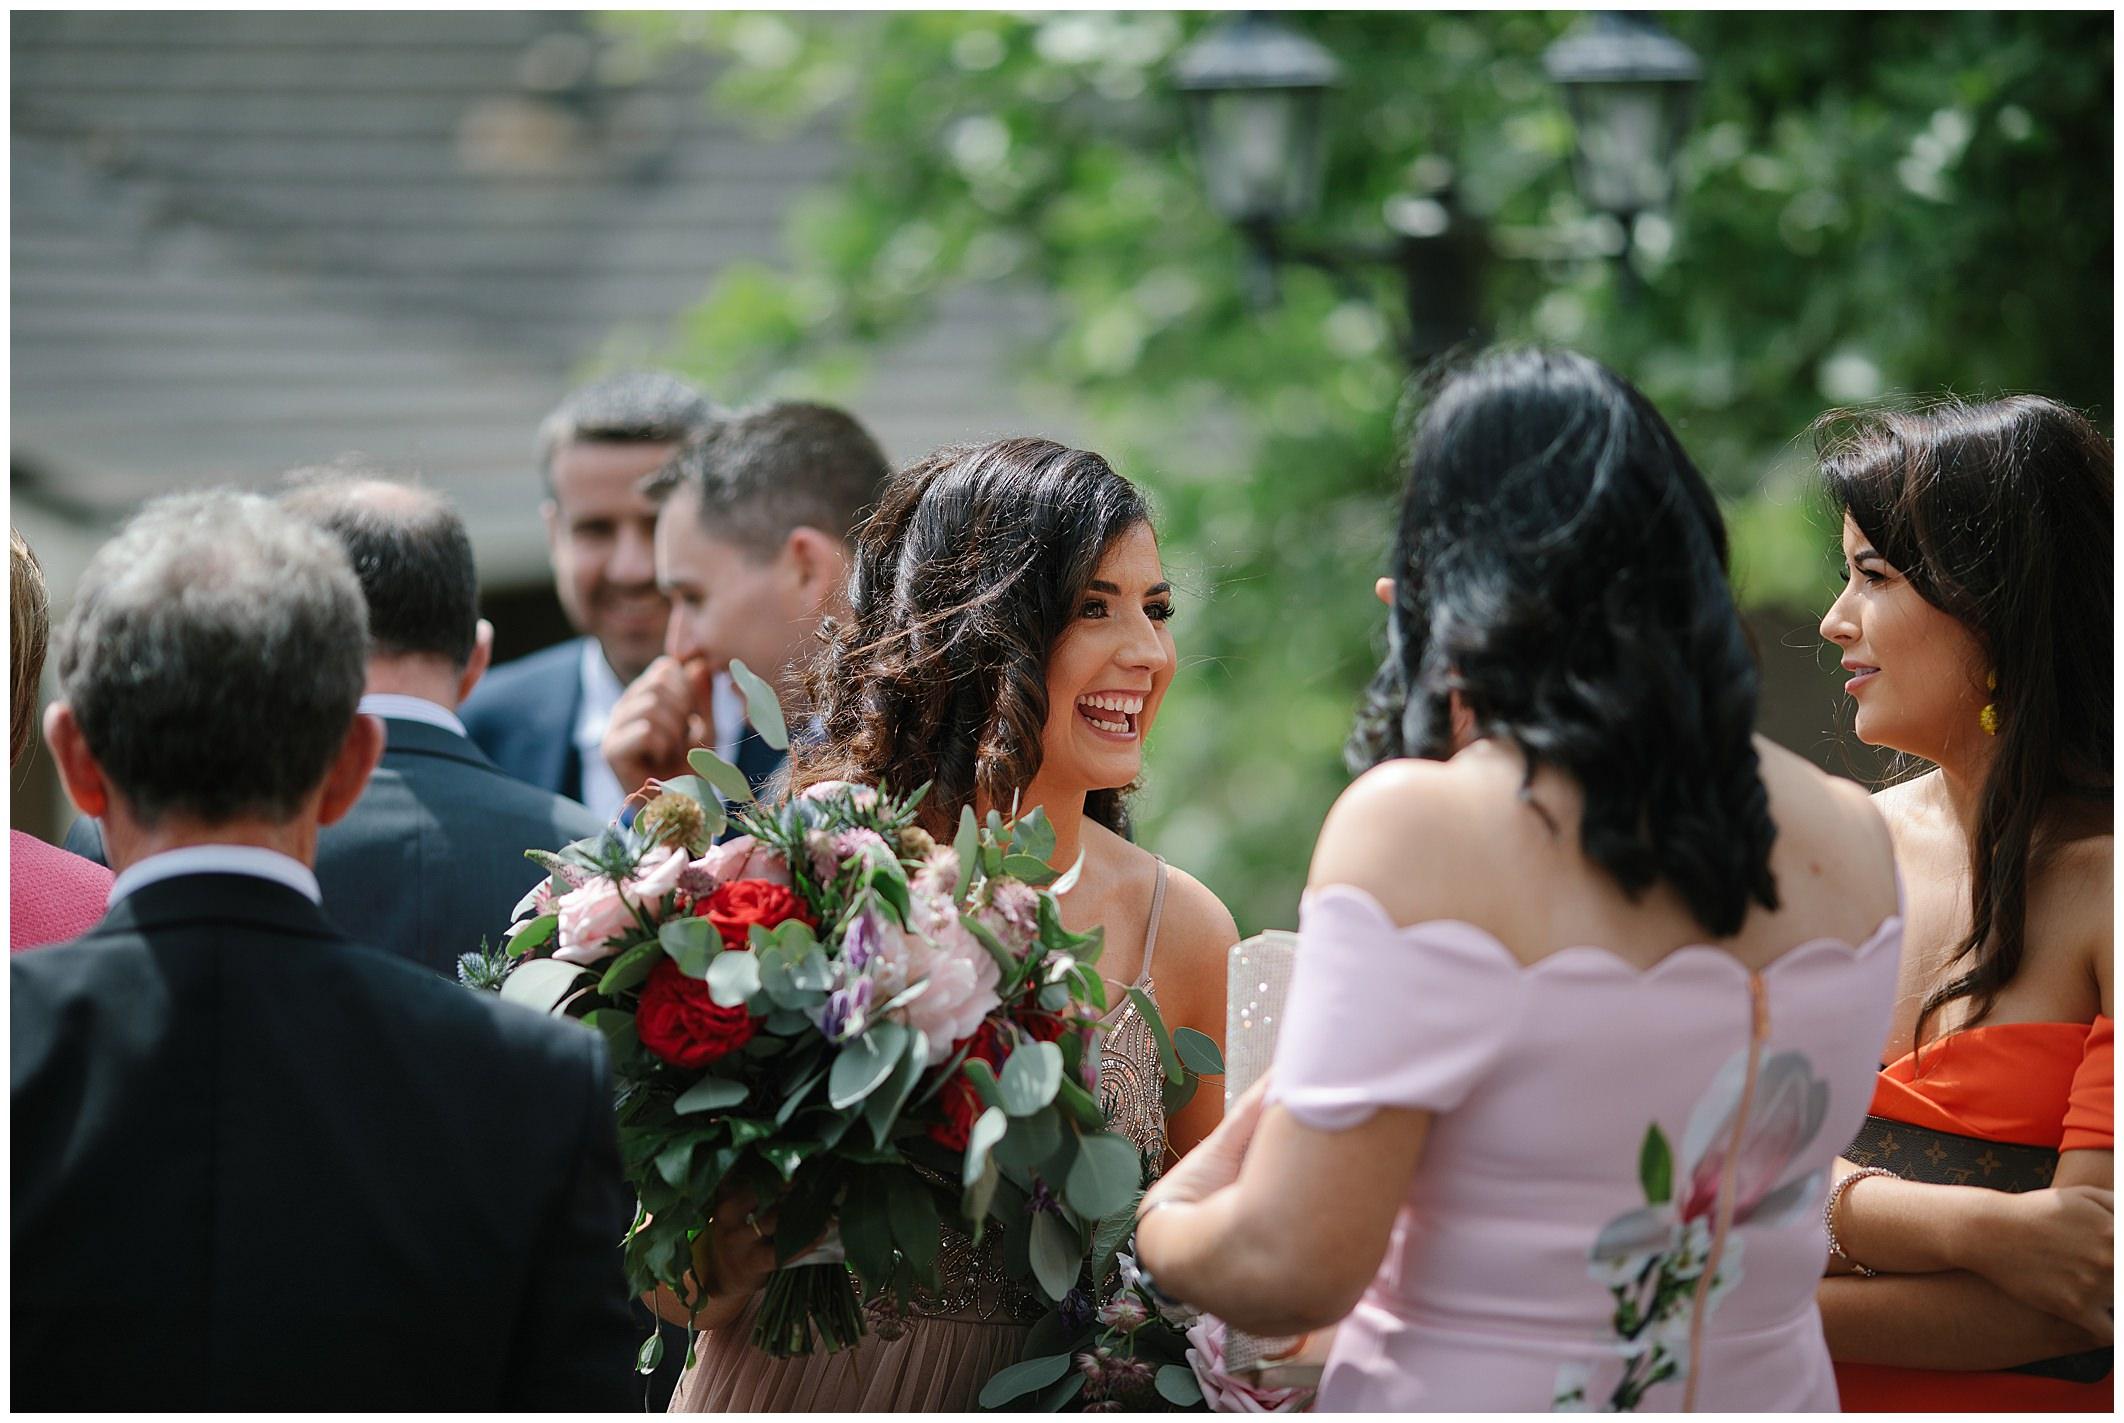 redcastle-hotel-wedding-karen-brian-jude-browne-photography-084.jpg